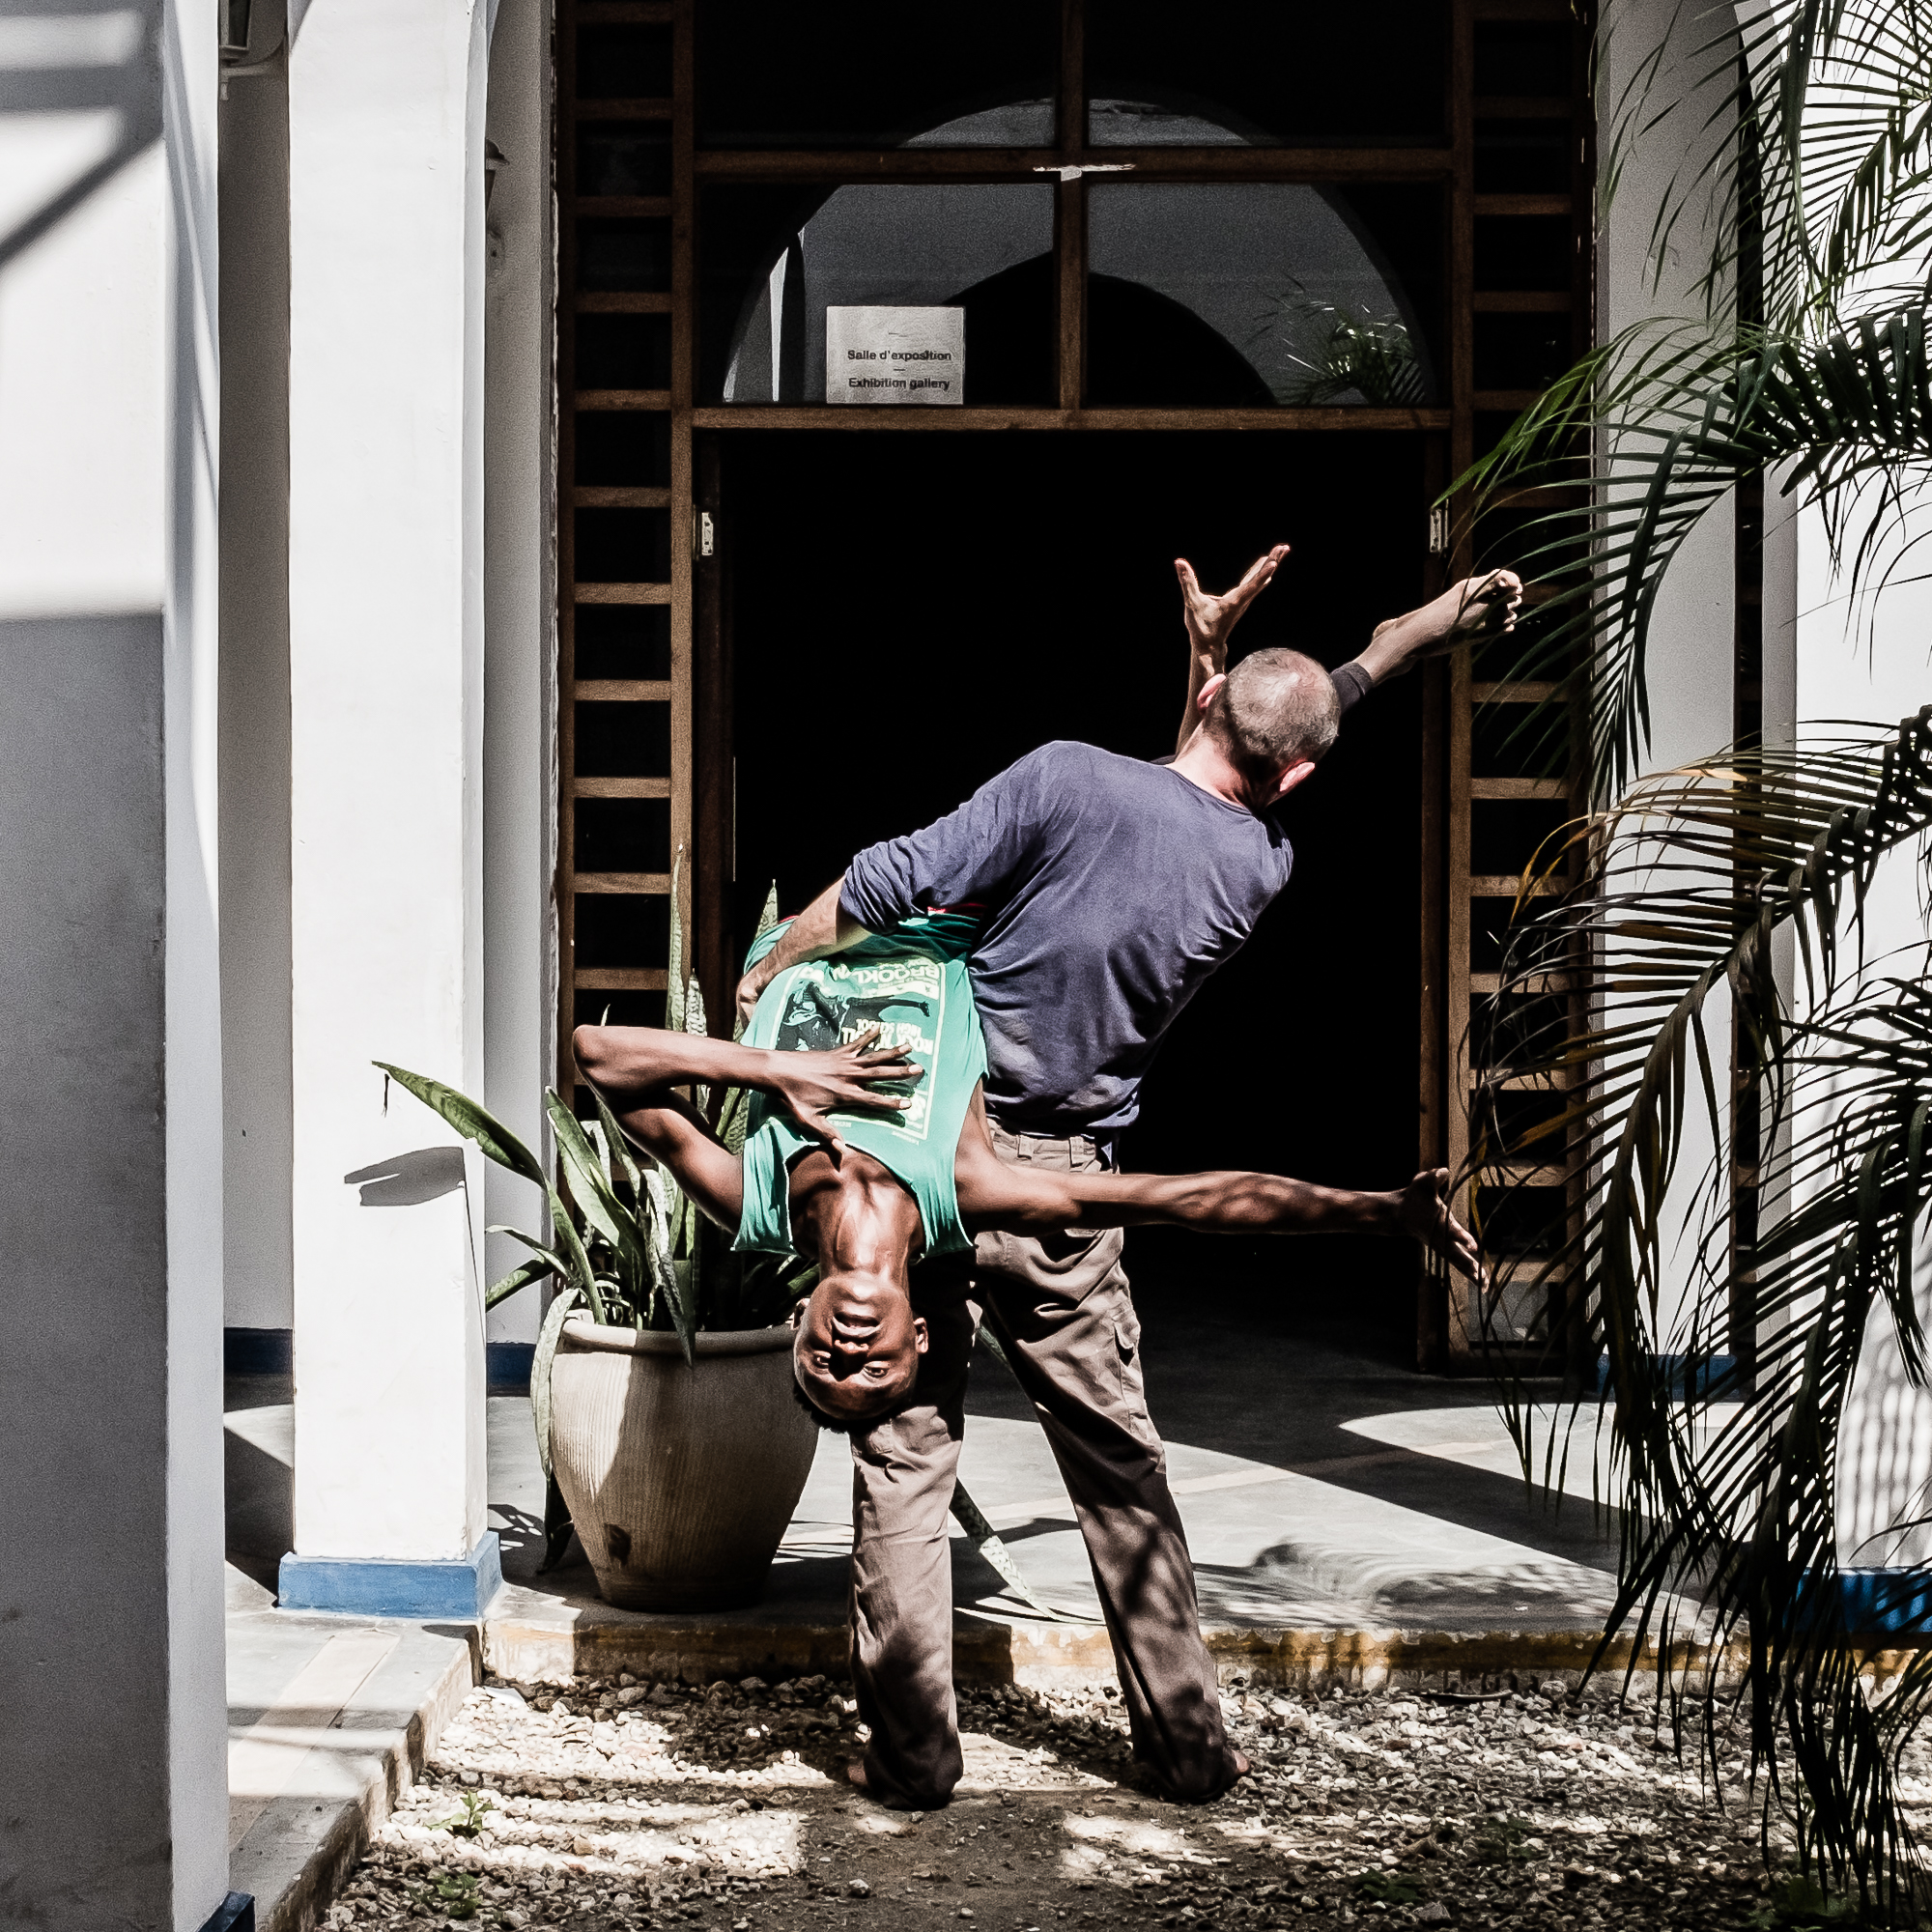 Dar Es Salaam - Kumi na sita